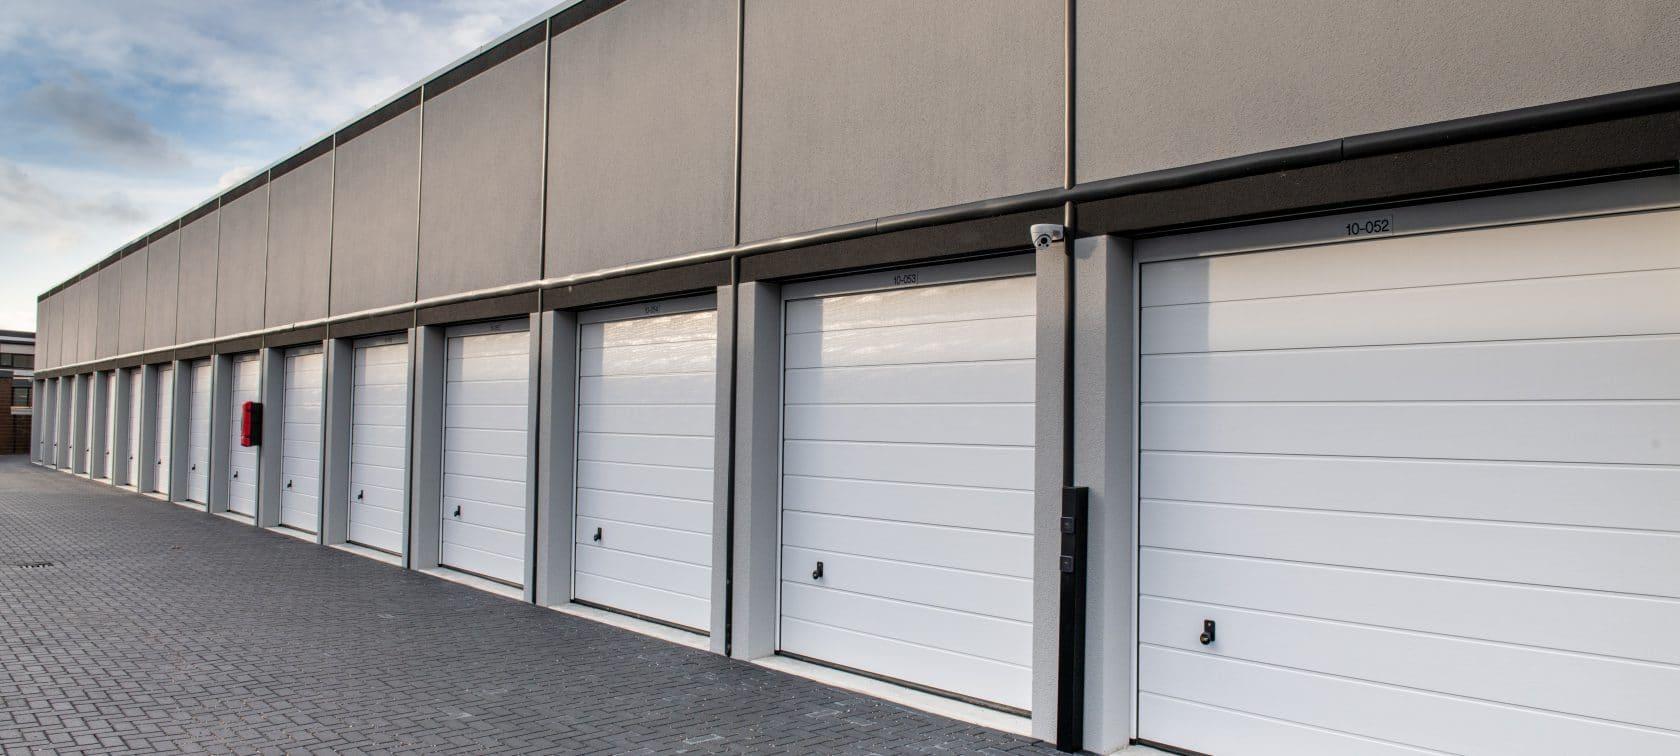 GaragePark Rotterdam Hordijk - garageboxen 4